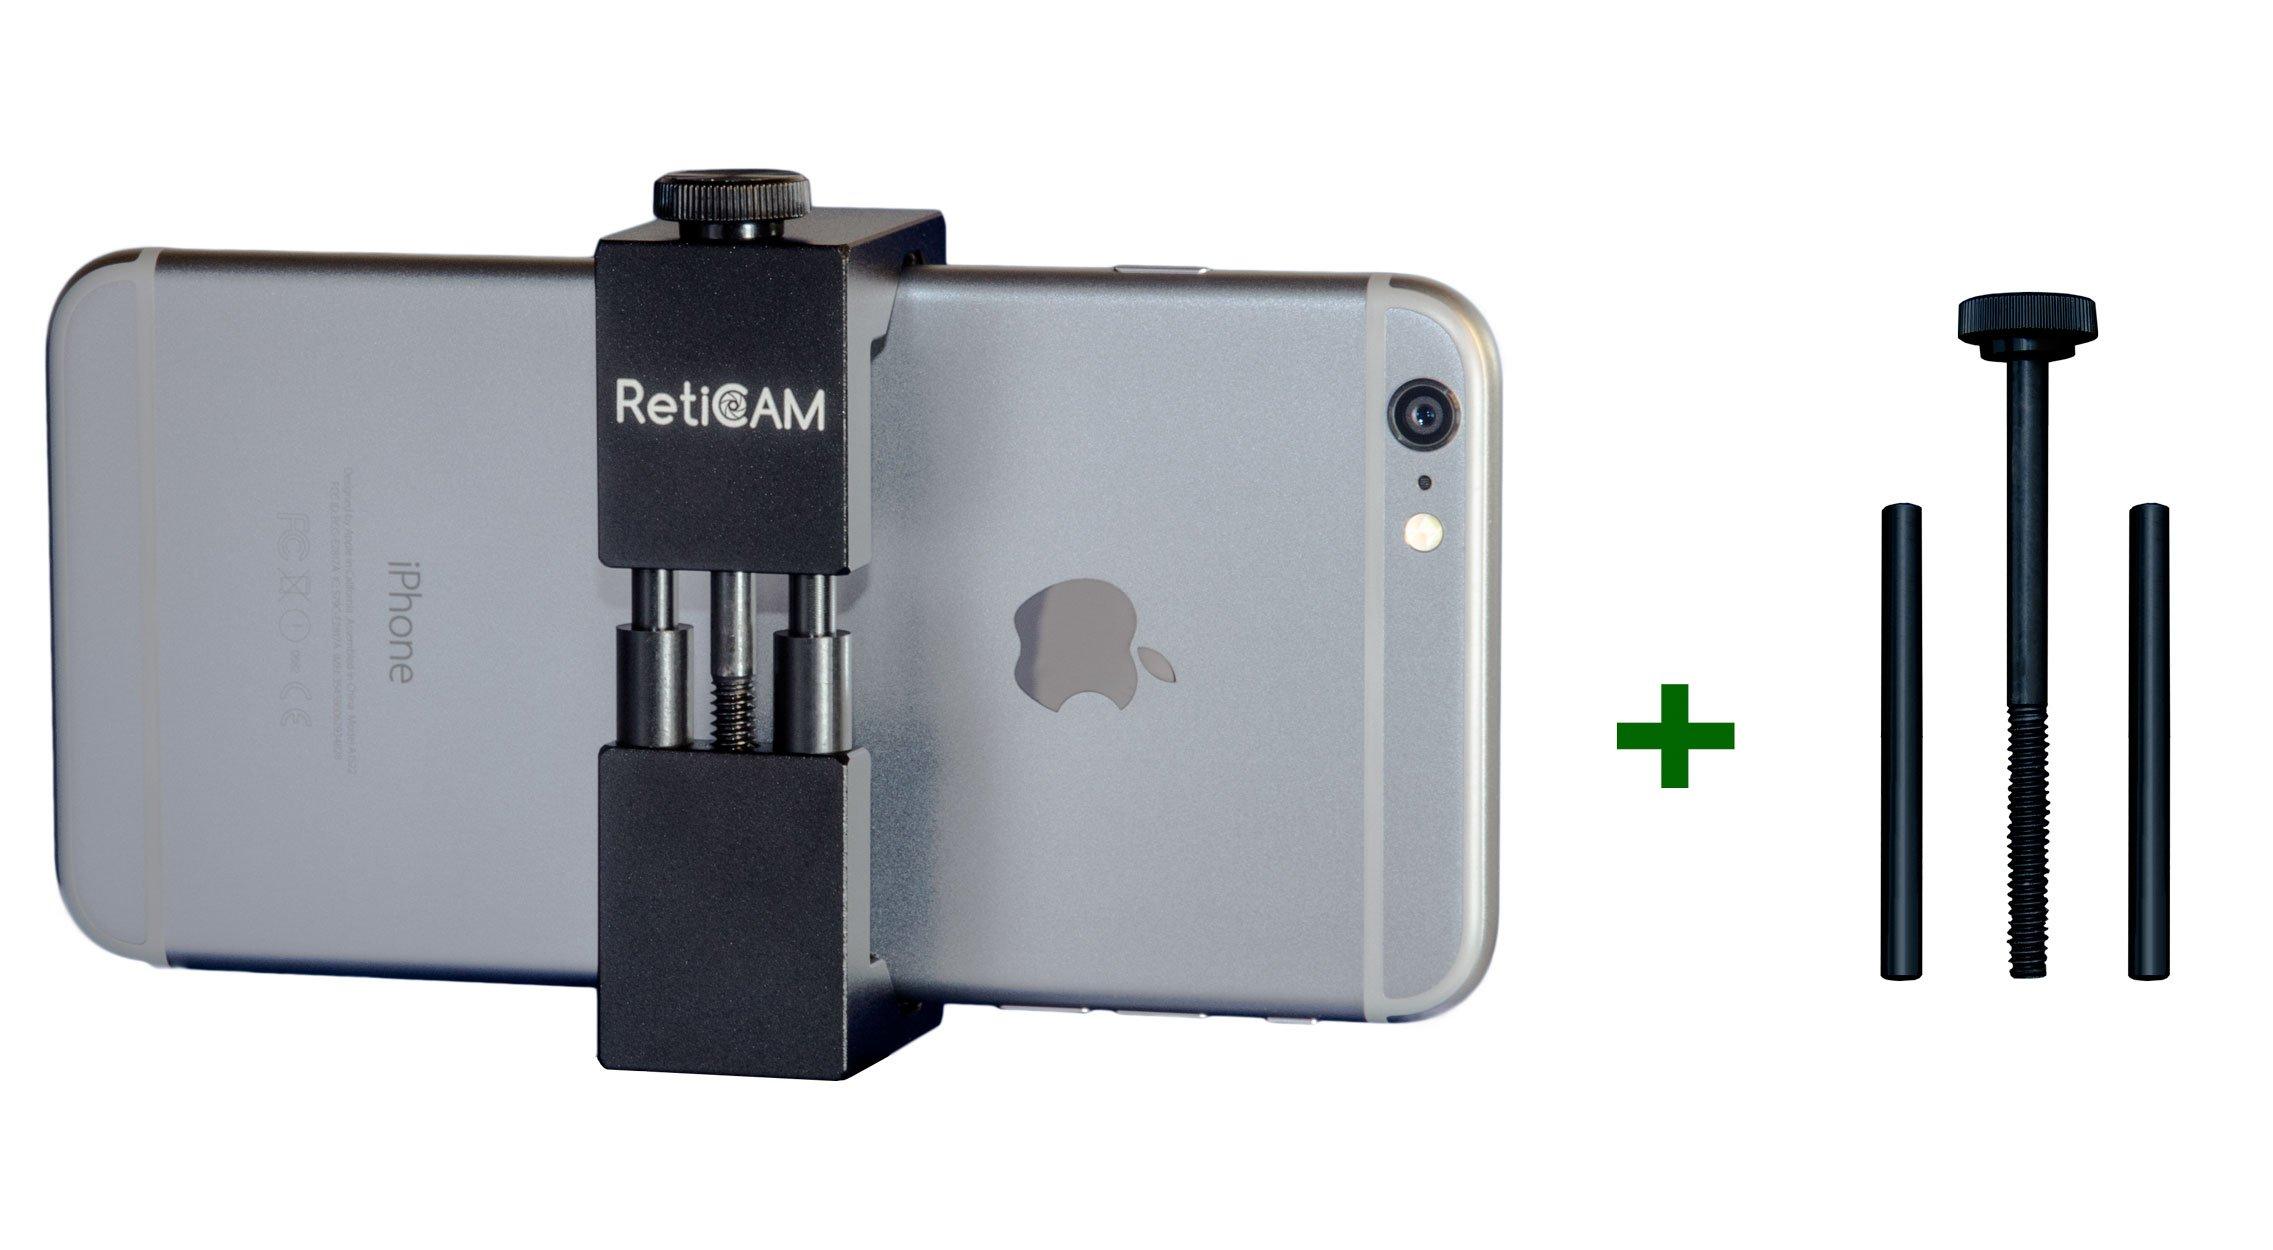 RetiCAM Smartphone Tripod Mount with XL Conversion Kit - Metal Universal Smart Phone Tripod Adapter - Standard Plus XL Conversion Kit